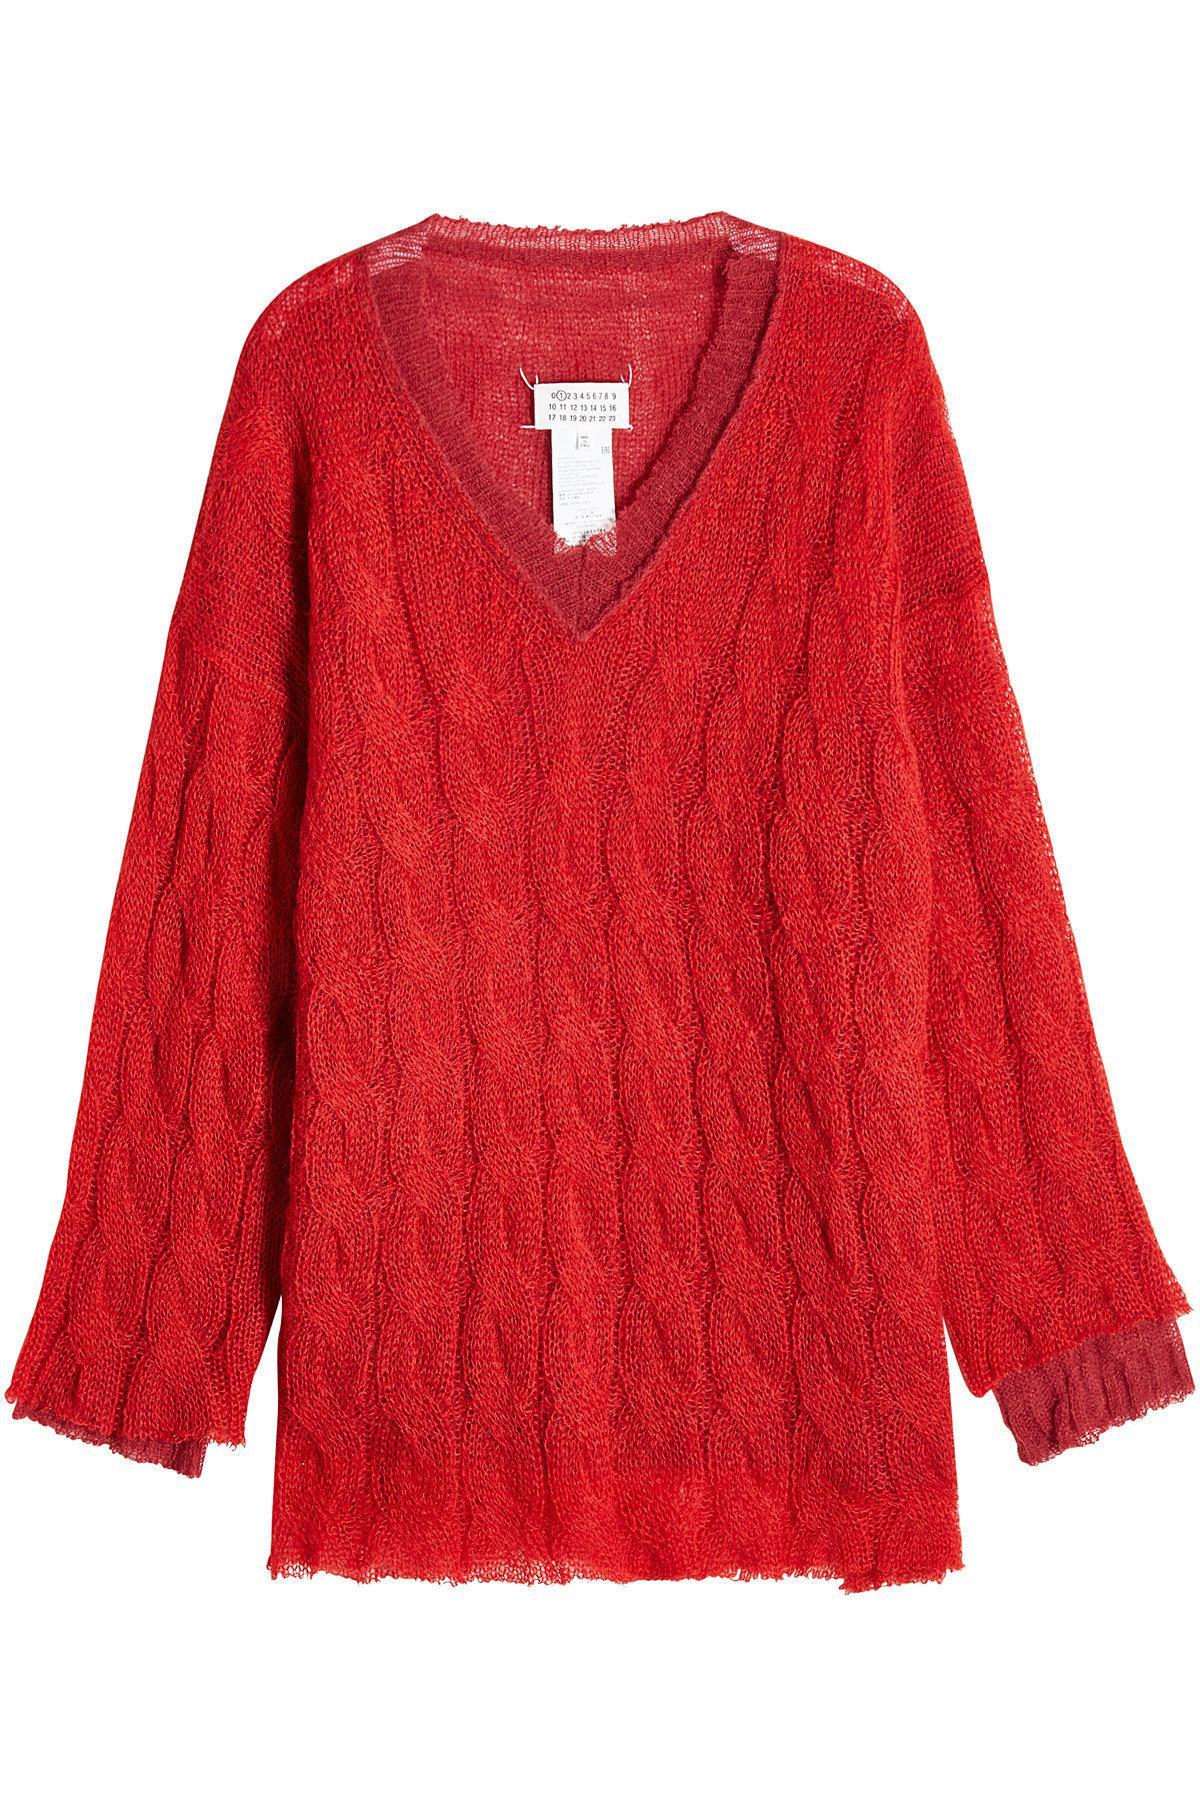 Lyst - Maison Margiela Cable Knit Pullover With Alpaca 6da4174d3